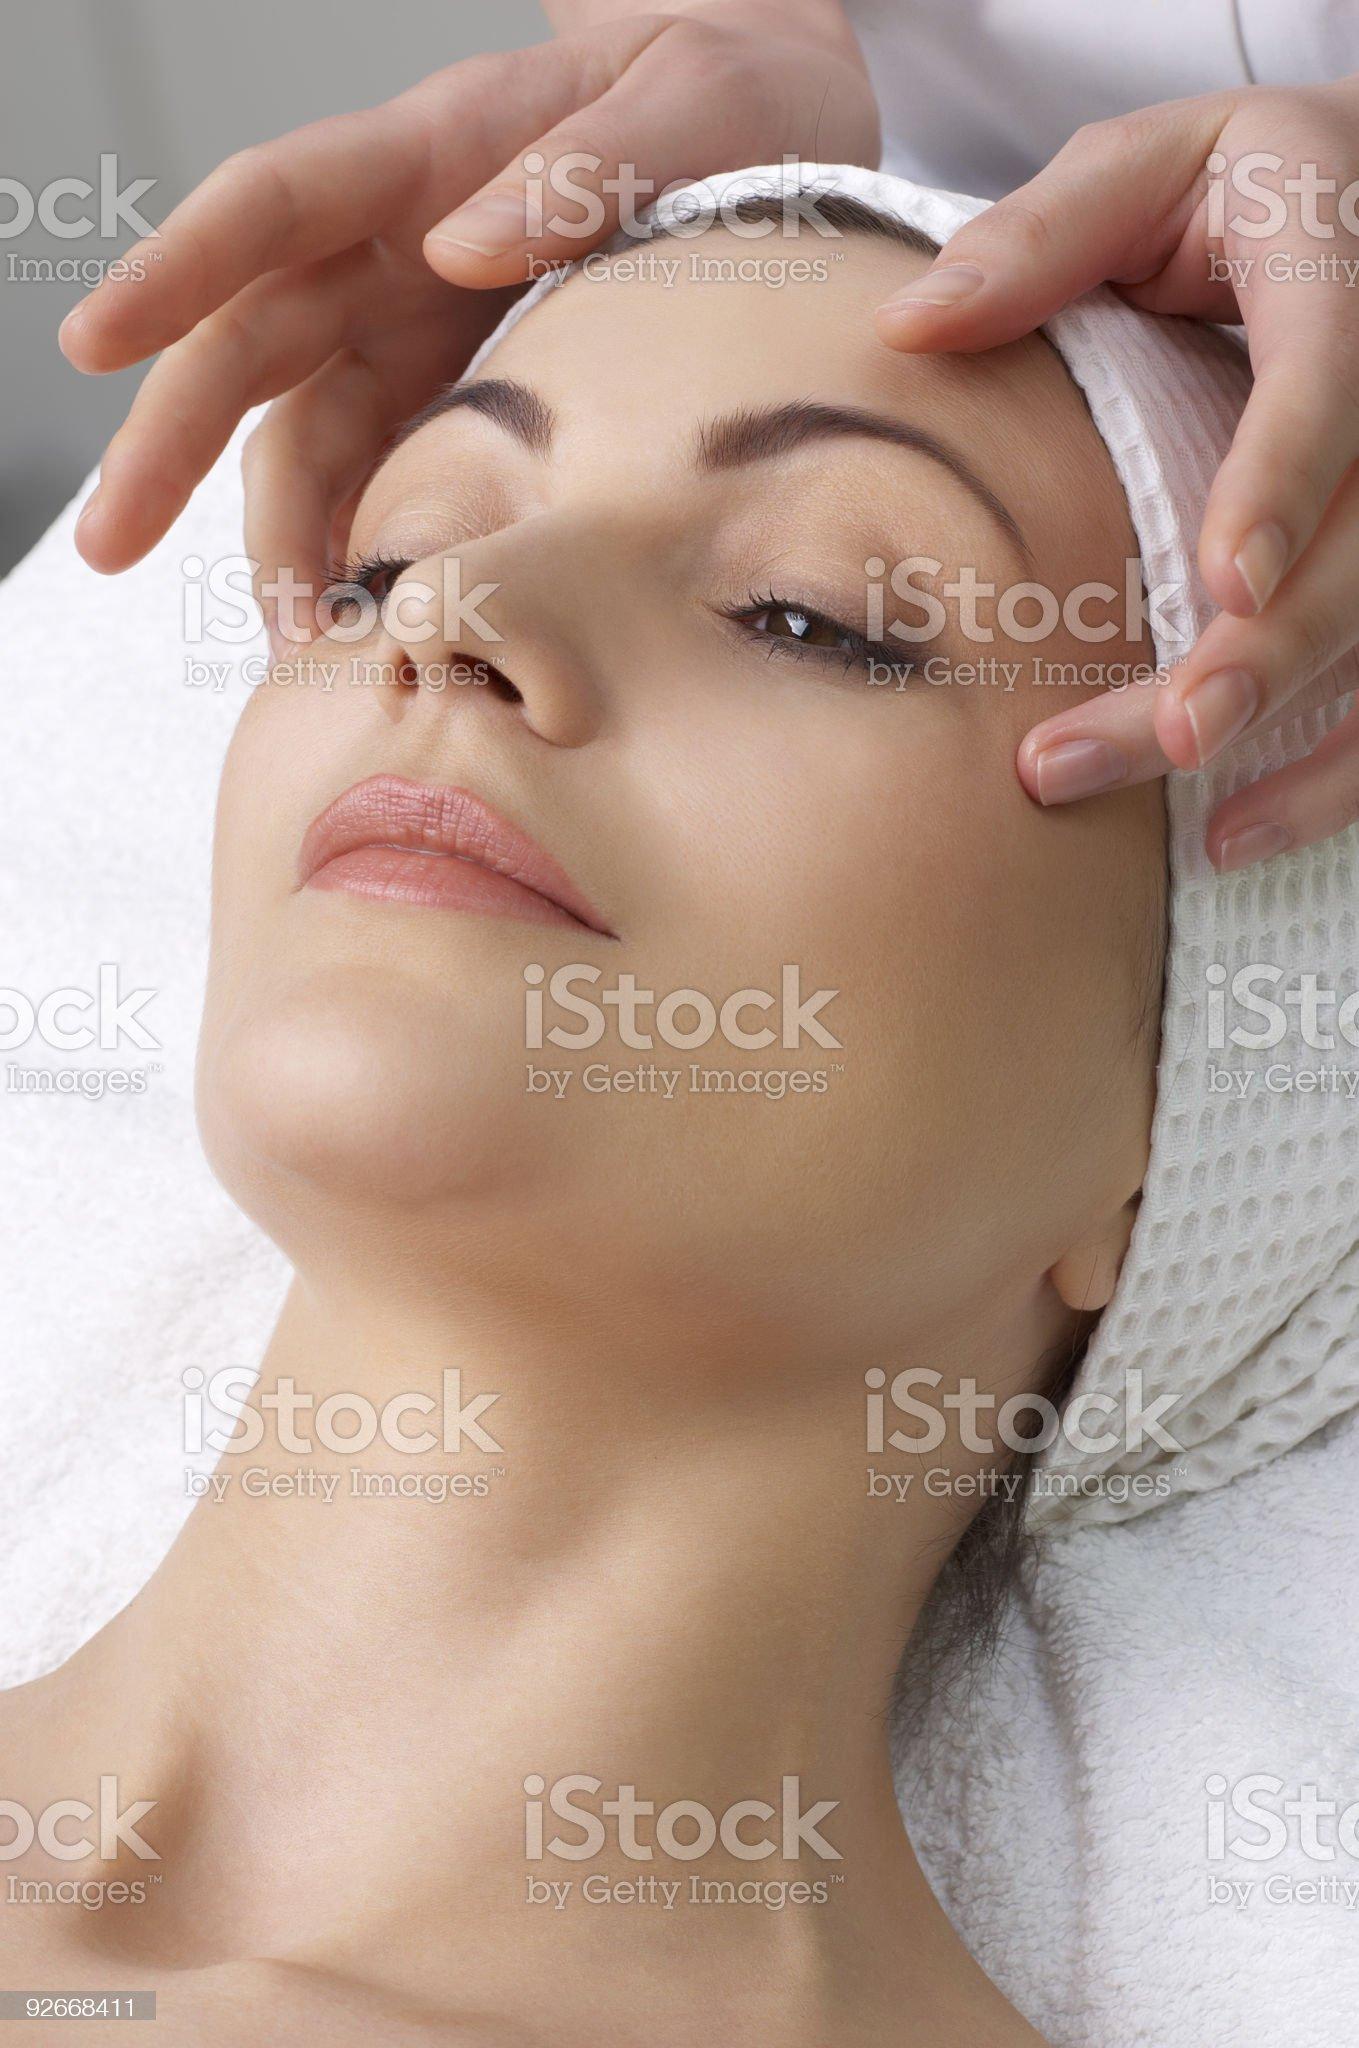 beauty salon series. facial massage royalty-free stock photo